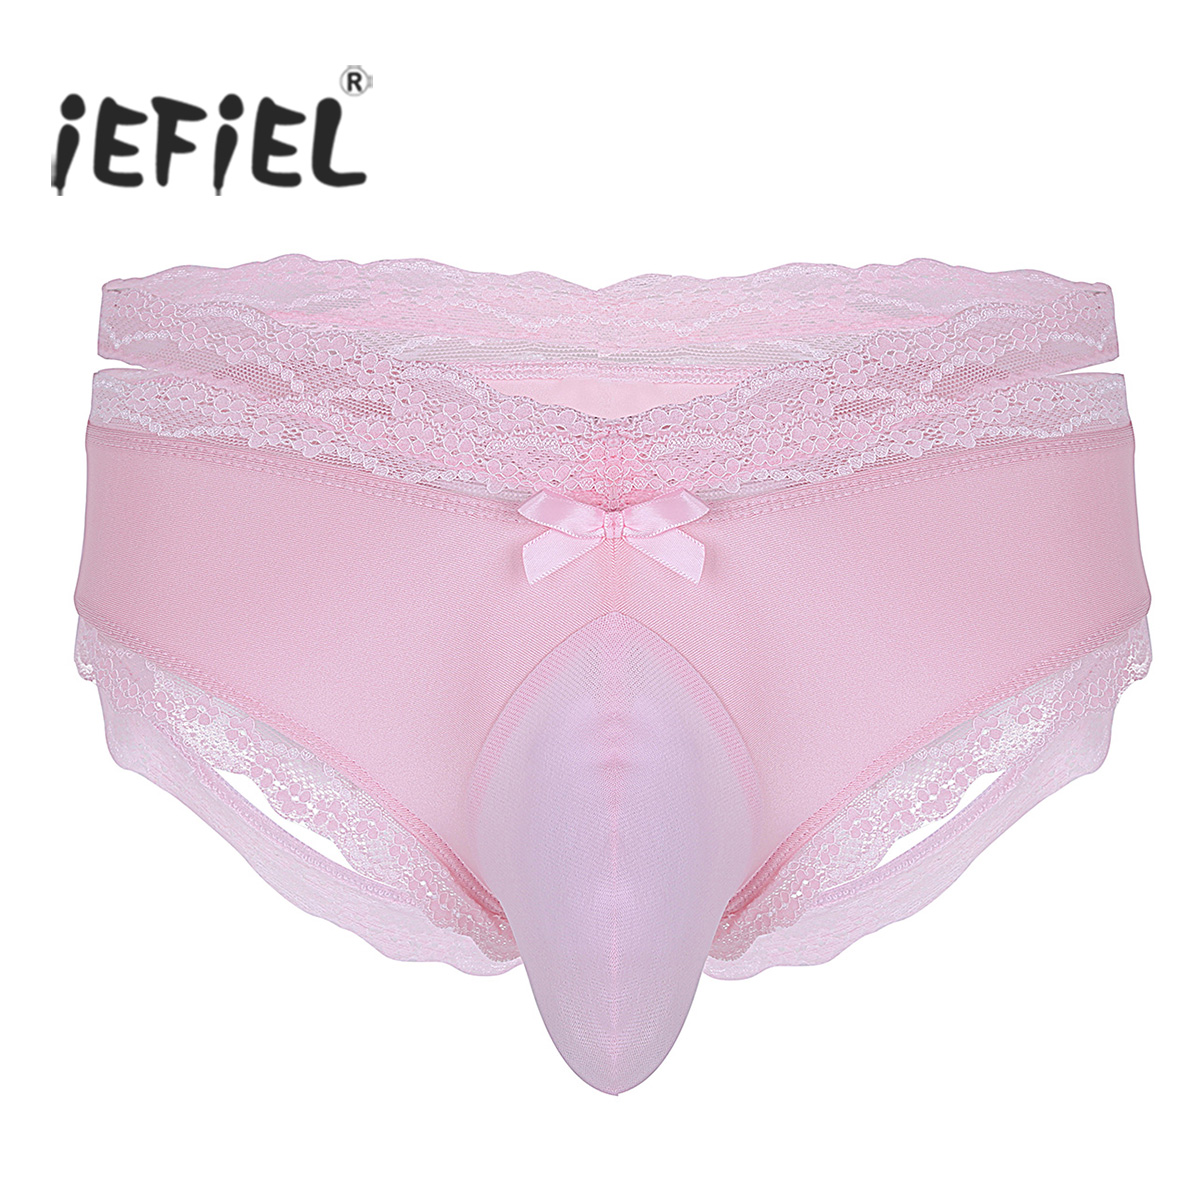 Mens Lingerie Sexy Panties Low Rise Open Back Lace Floral Bulge Pouch Sissy Jockstraps -3275